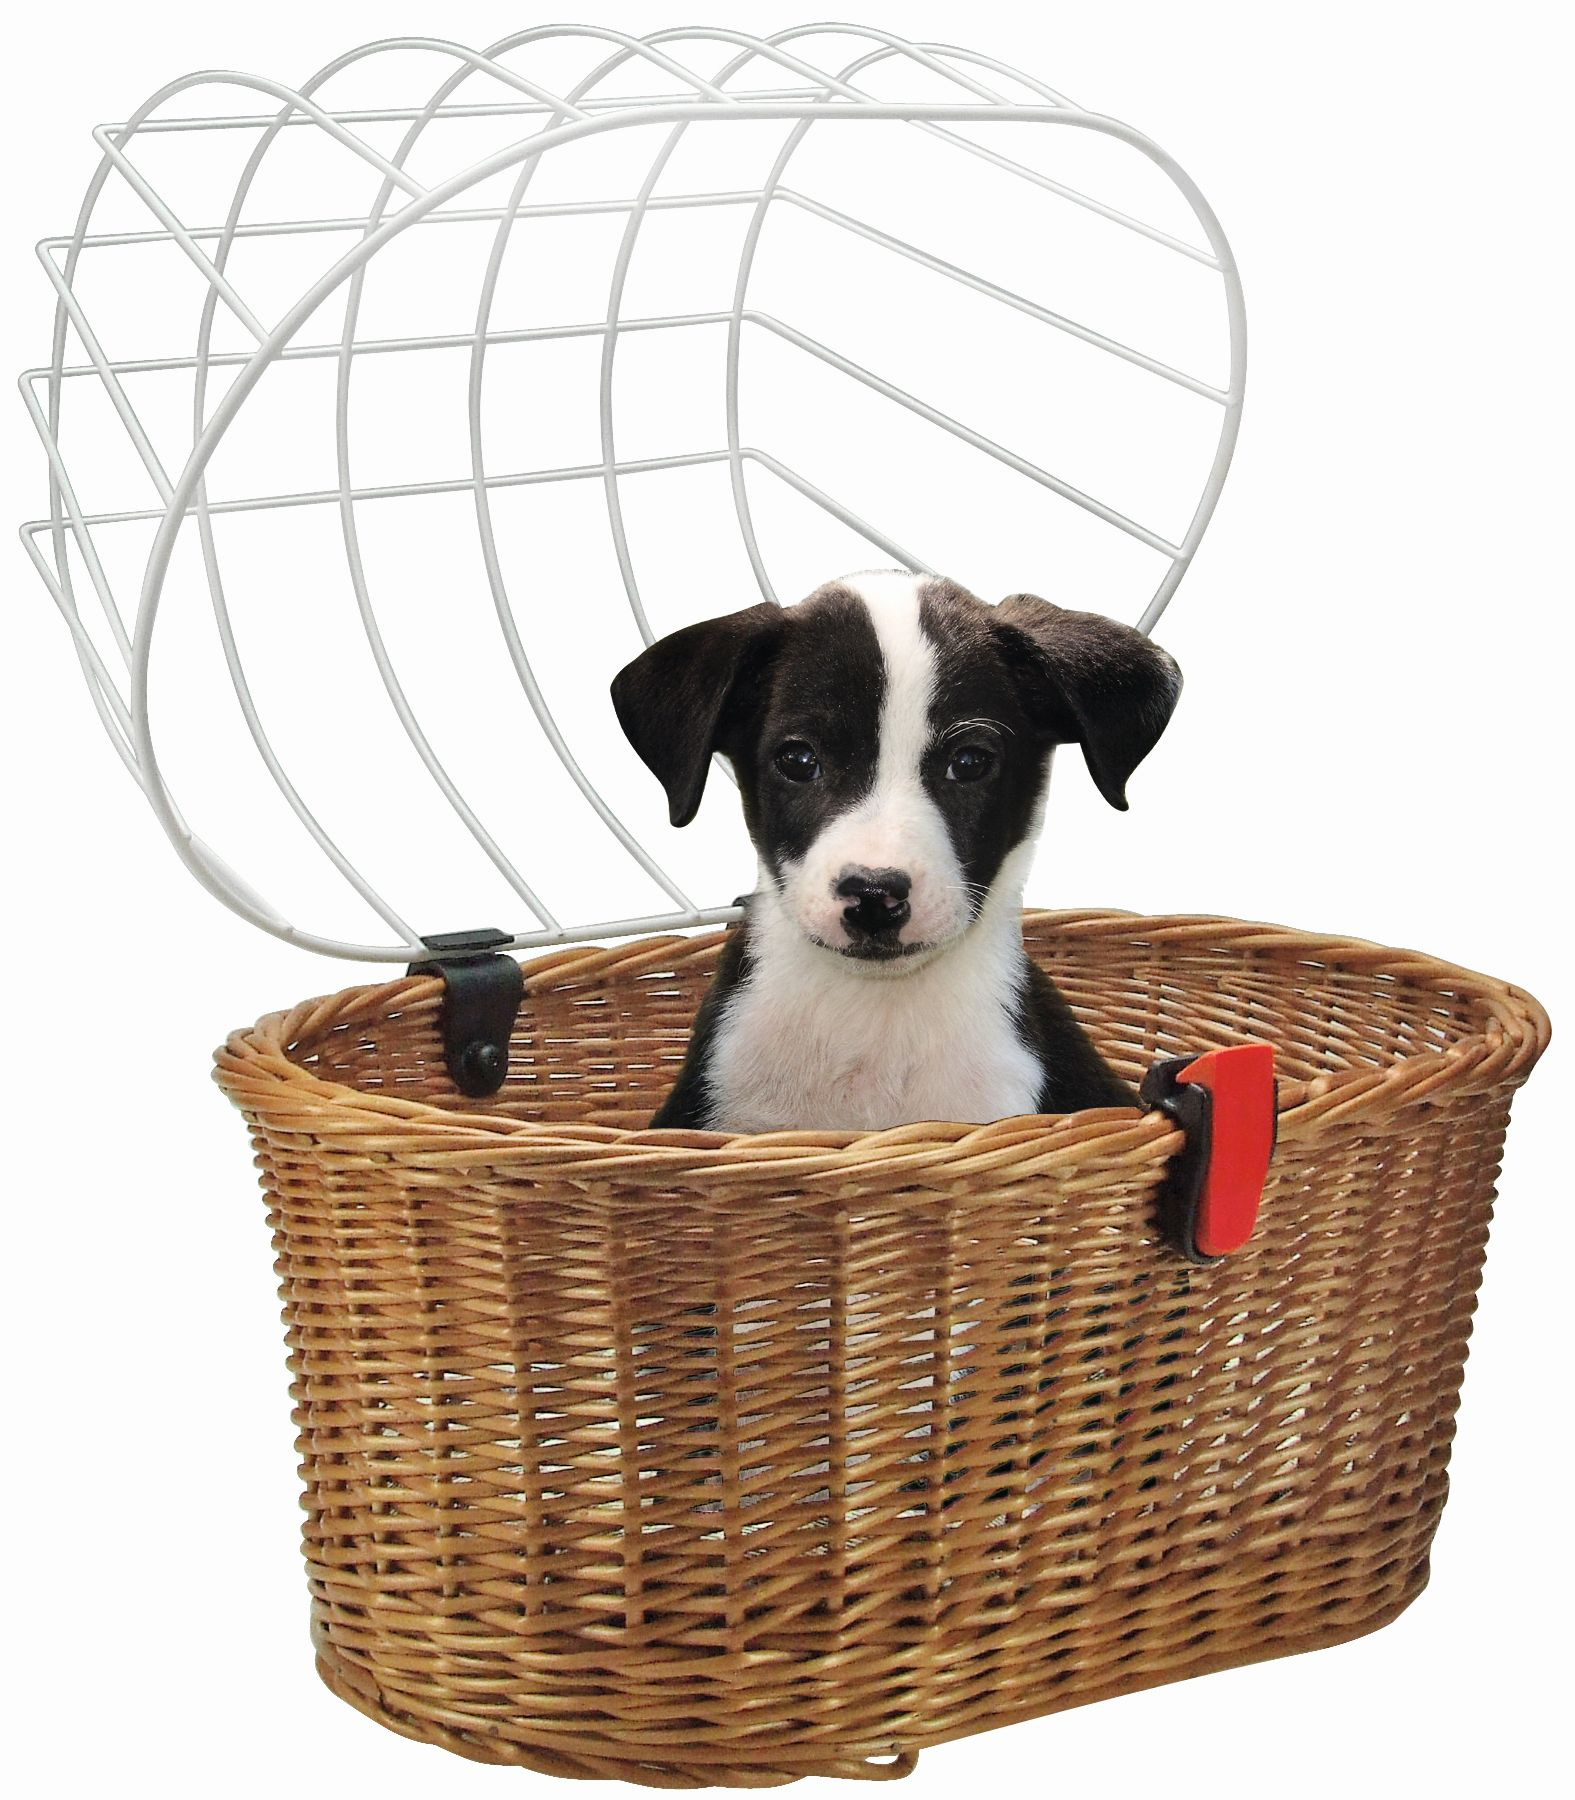 körbe & koffer zubehör/Koffer & Körbe: Rixen & Kaul  Hundekorb Festmontage Doggy Baskit fix